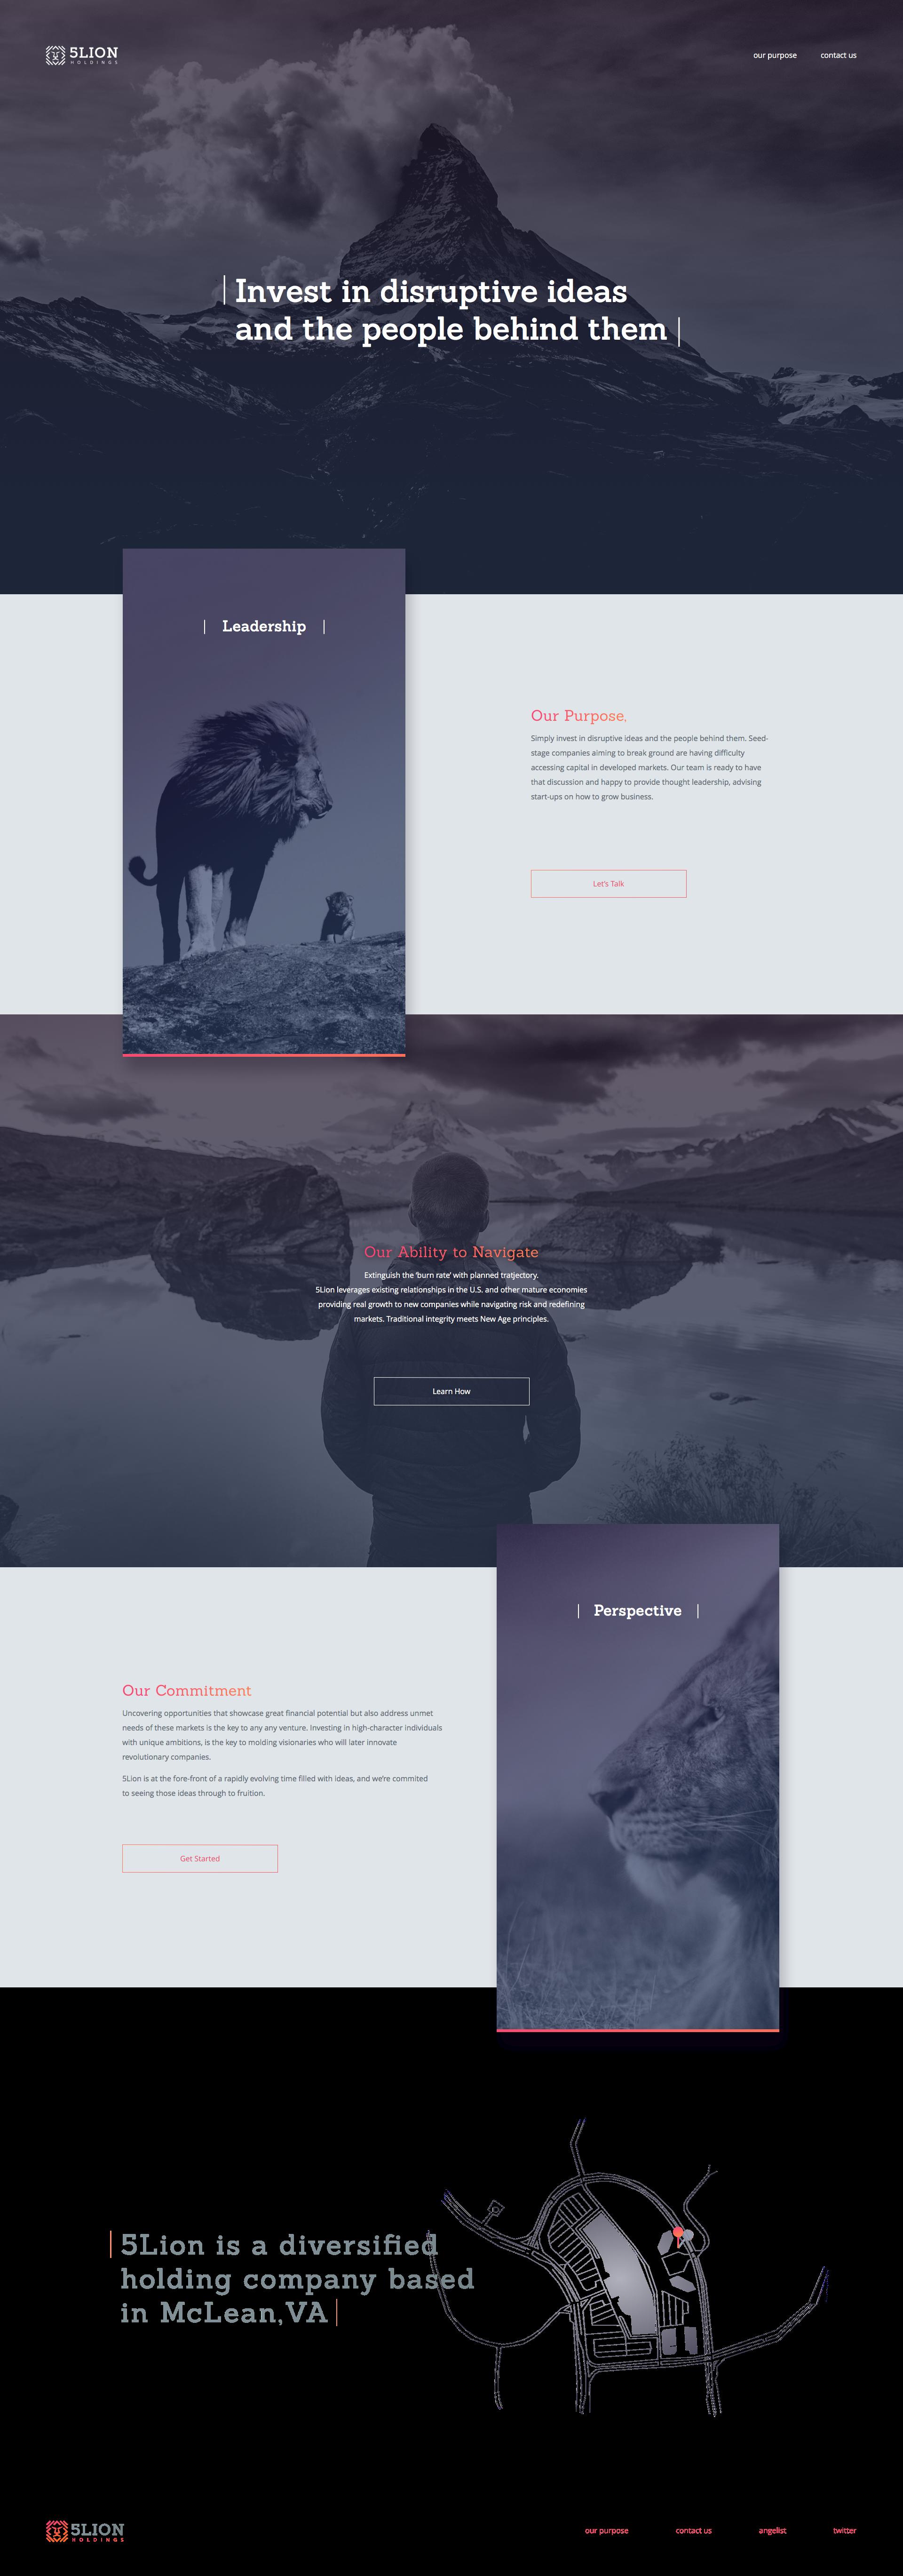 Brand Website Reveal Ivy City Co Mara Design Co Branding Logo Typeface Design Inspiration Web Design Color Website Branding Web Design Trends